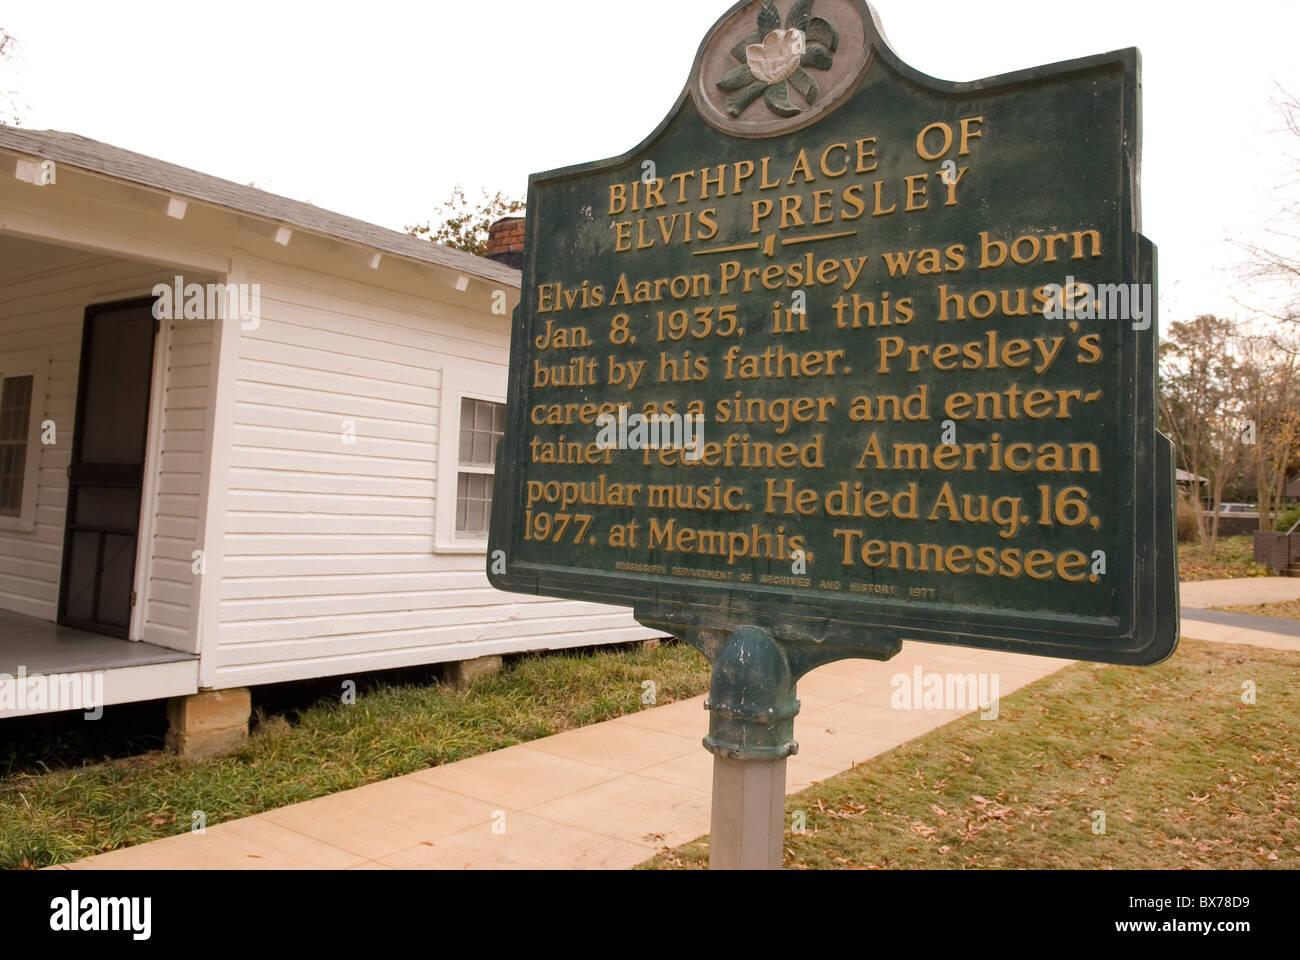 Elvis Presley Childhood Home Museum Tupelo Mississippi USA - Stock Image